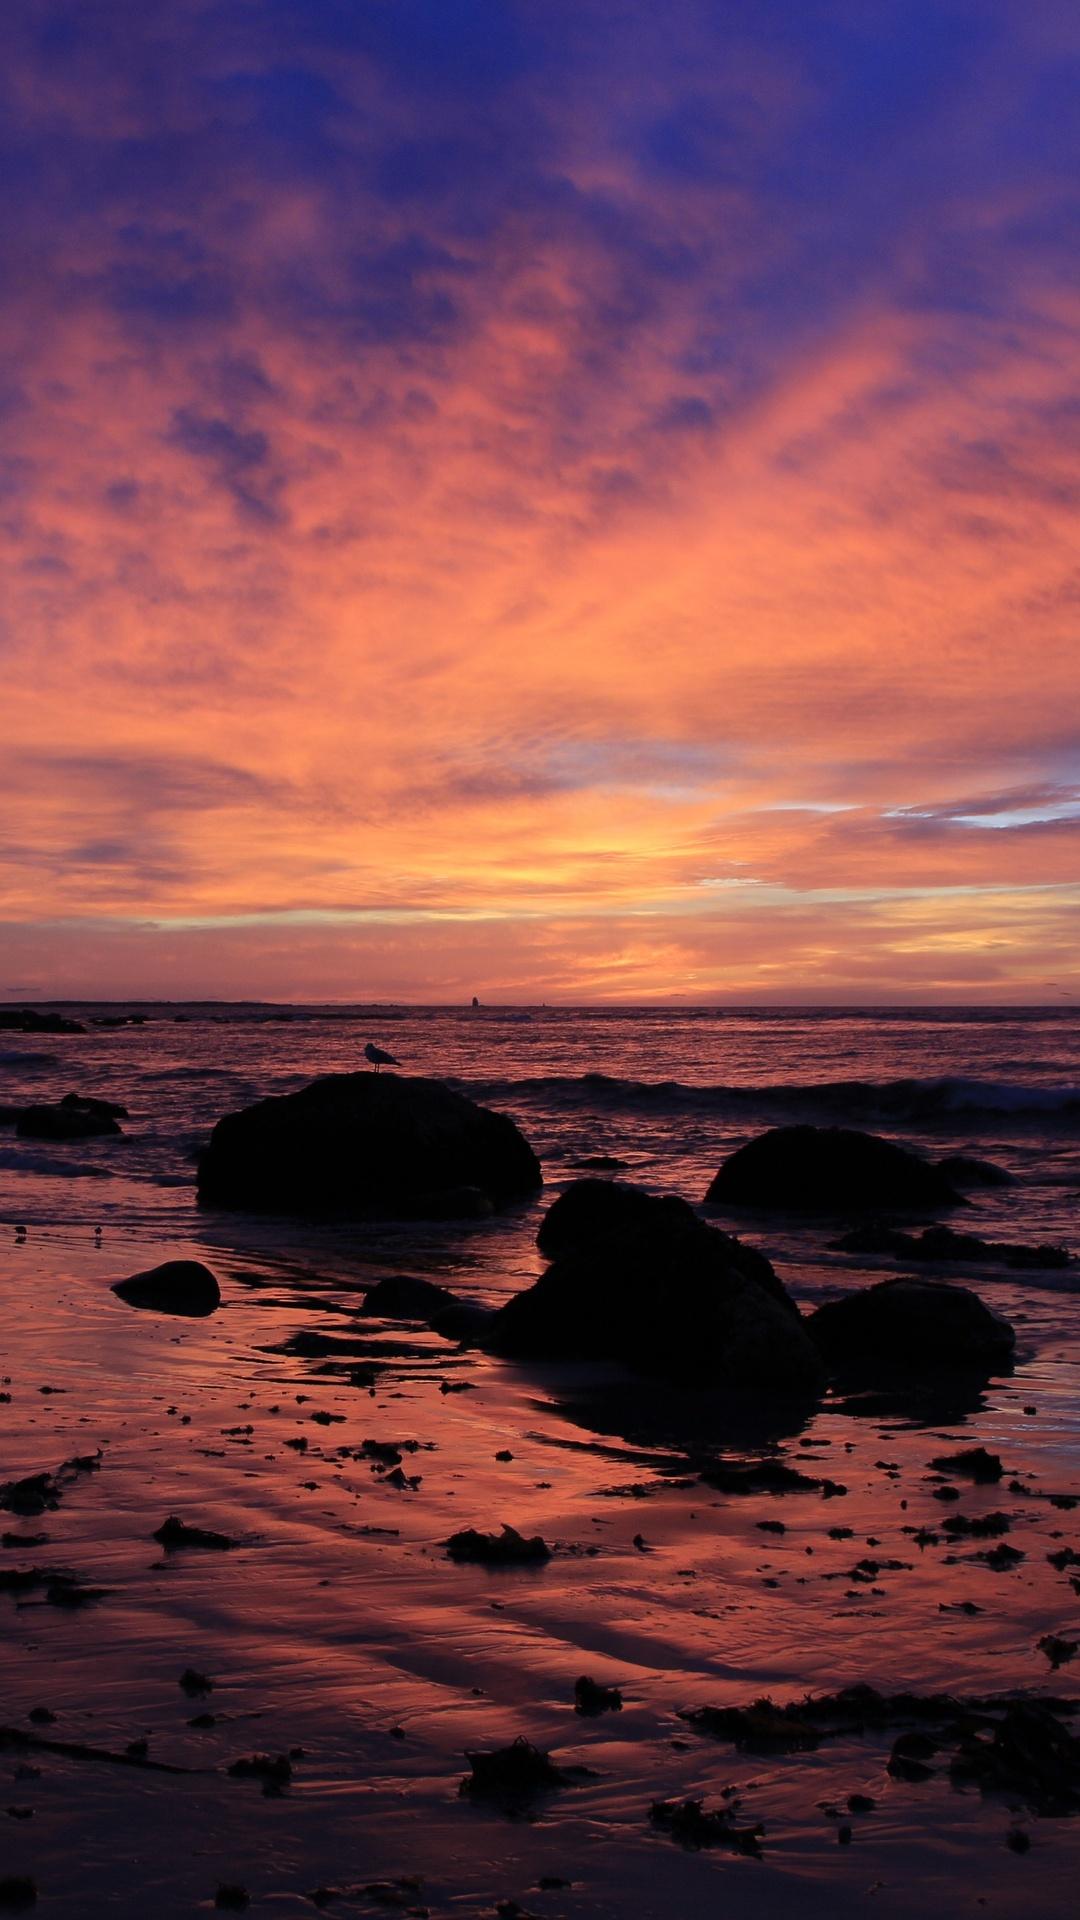 1080x1920 Sunrsie Beach Ocean Sky 4k Iphone 7,6s,6 Plus ...